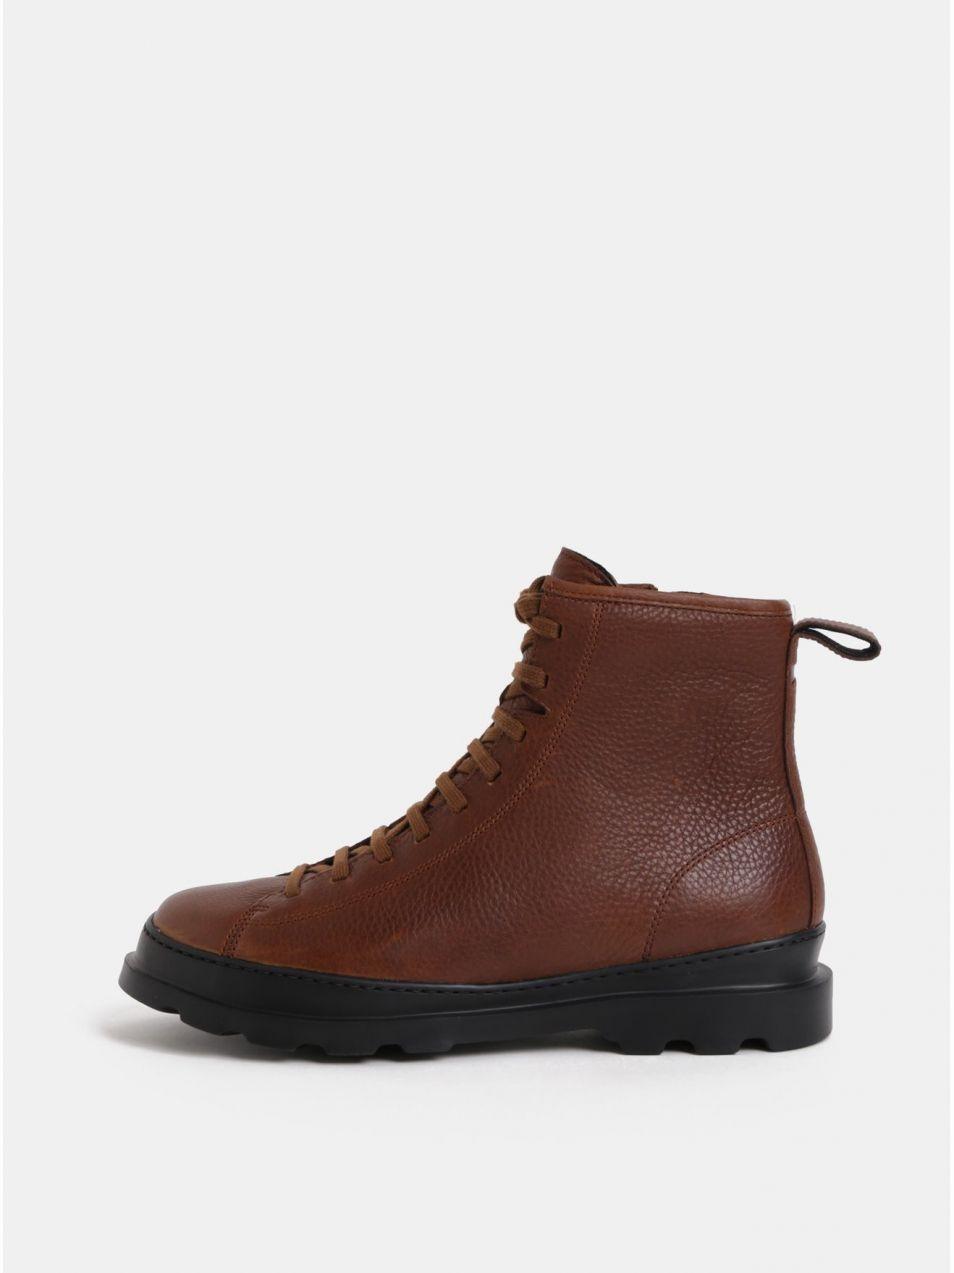 Hnedé pánske kožené členkové topánky Camper Brutus značky Camper - Lovely.sk b64de3550b5